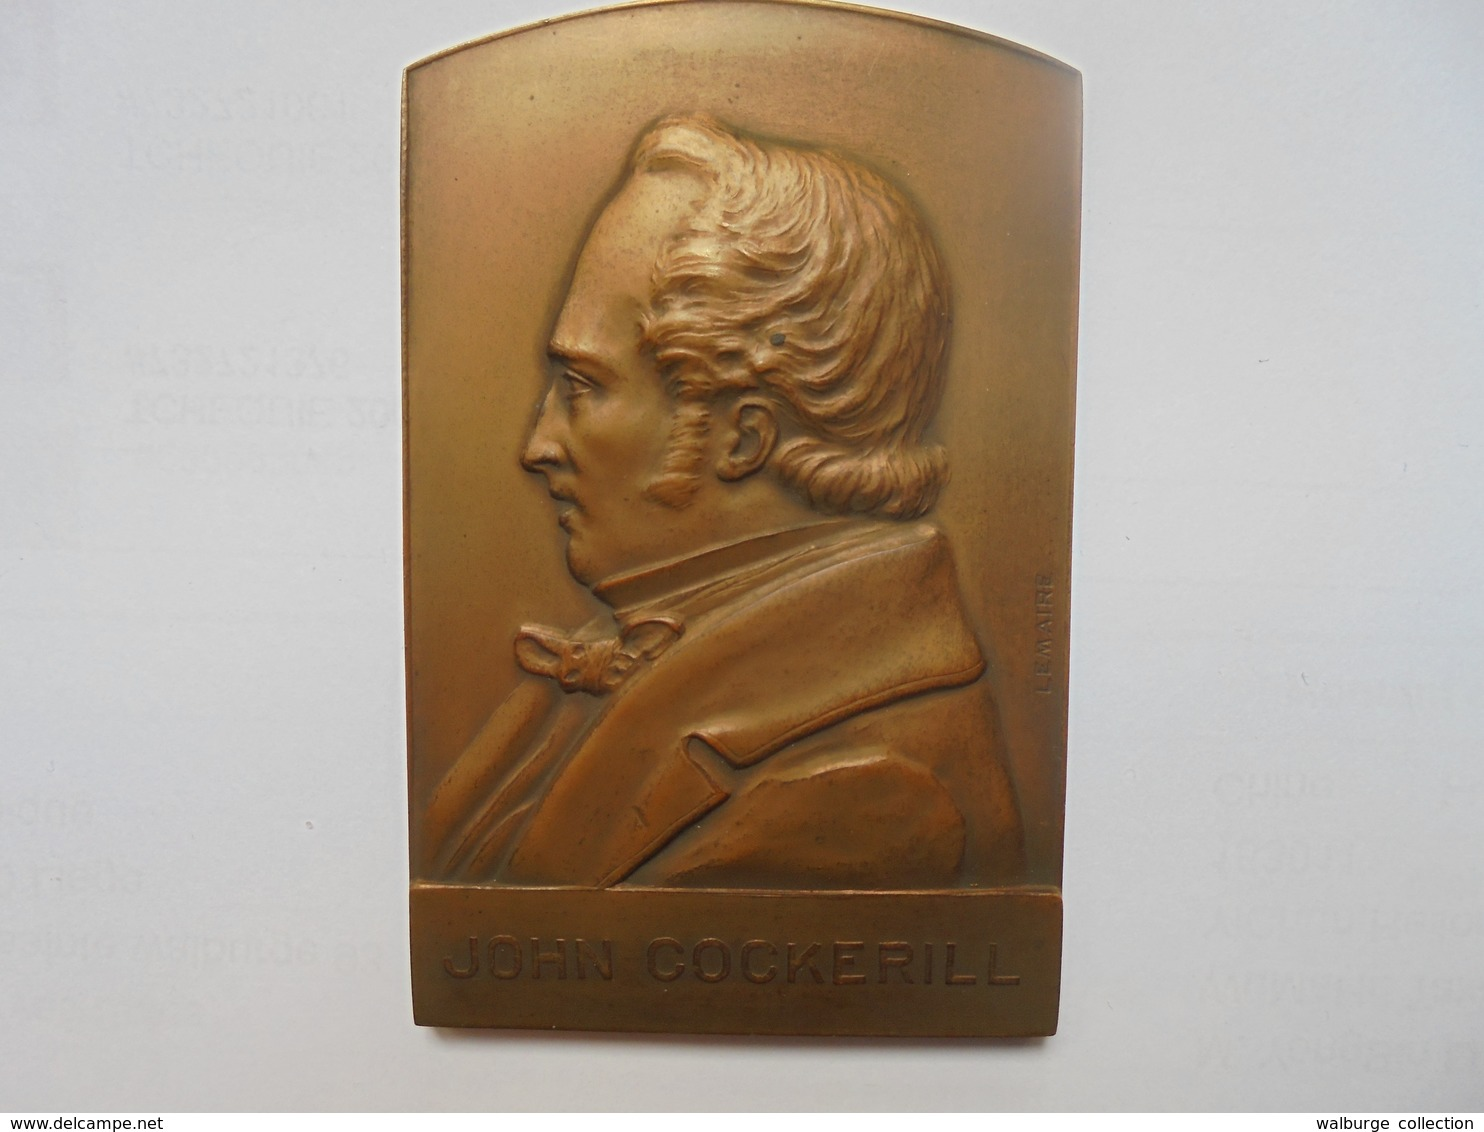 SOCIETE JOHN COCKERILL 1927-122 Par DEVREESE Grammes-80/50 Mm - Professionals / Firms